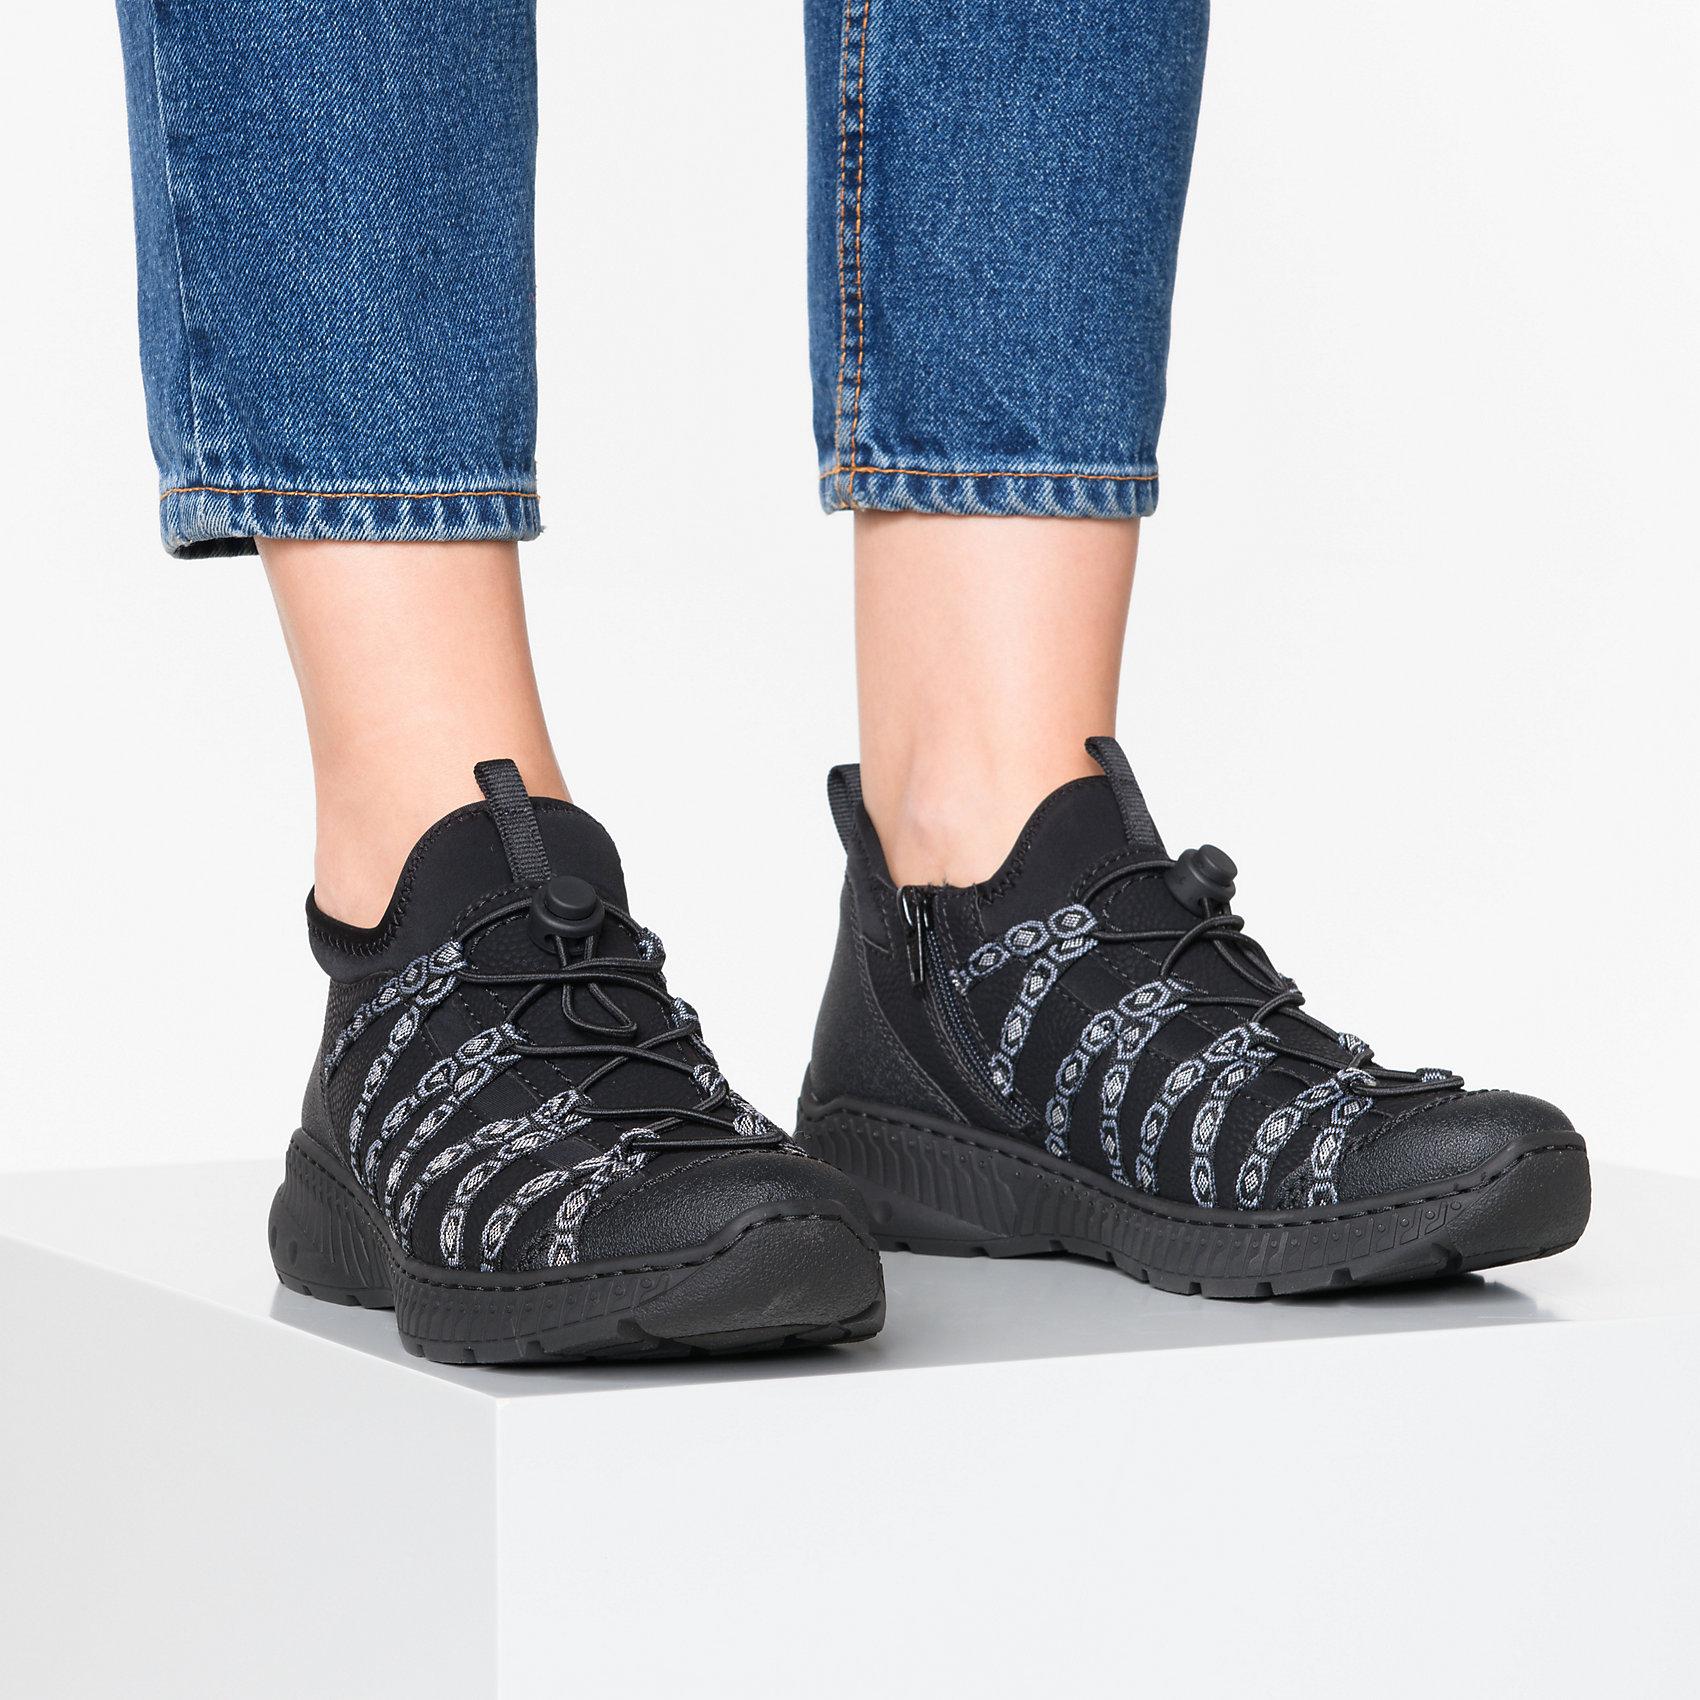 Neue Sneaker 2021 Damen